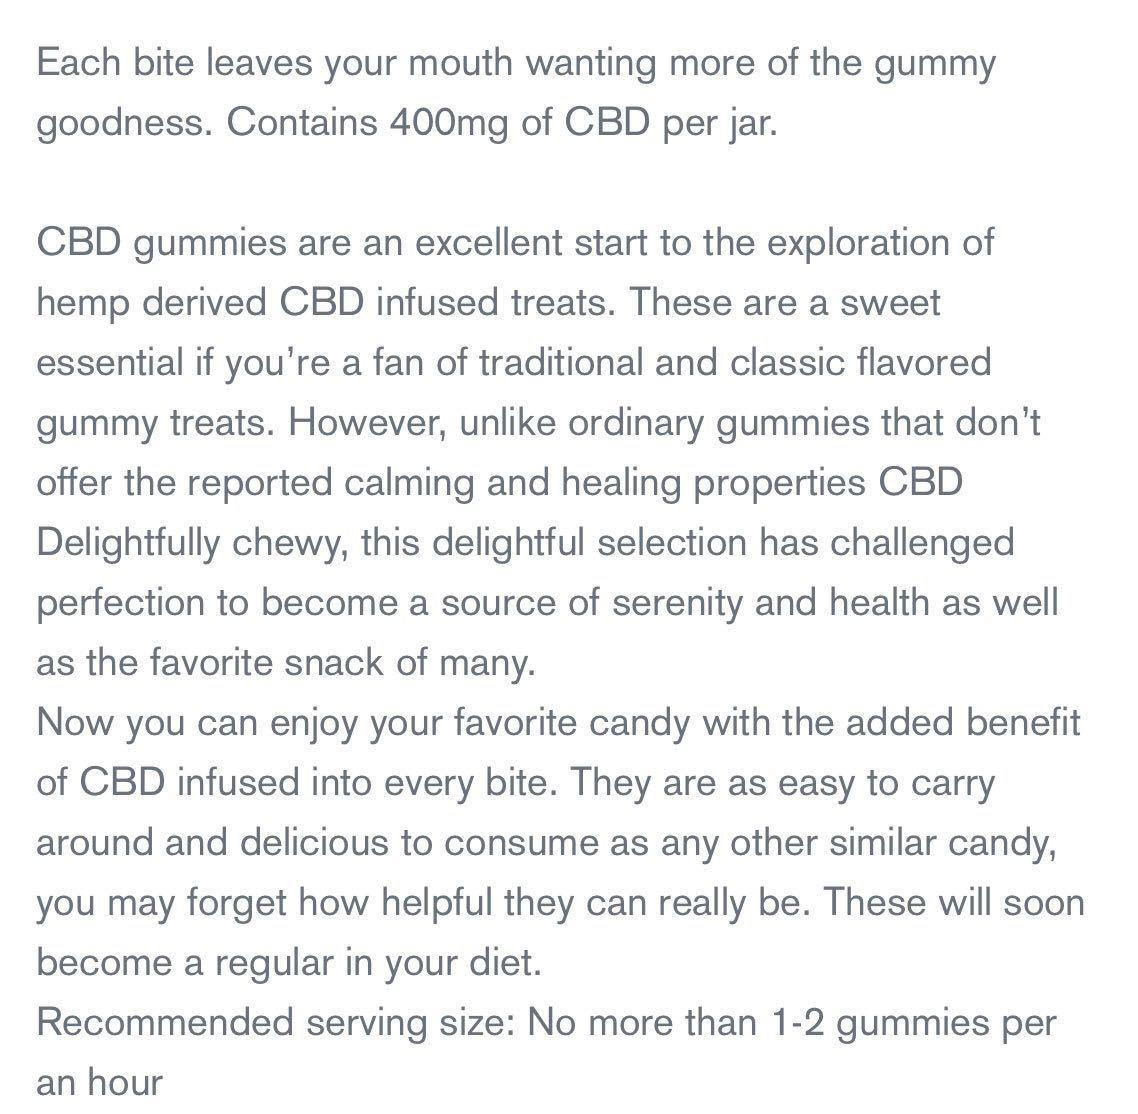 CBD 配合 フルーツ味 CBD400mg 高濃度 高品質 CBDoil ヘンプ remedy candy グミ 健康食品 オイル アメリカお菓子 元気 送料無料_画像4